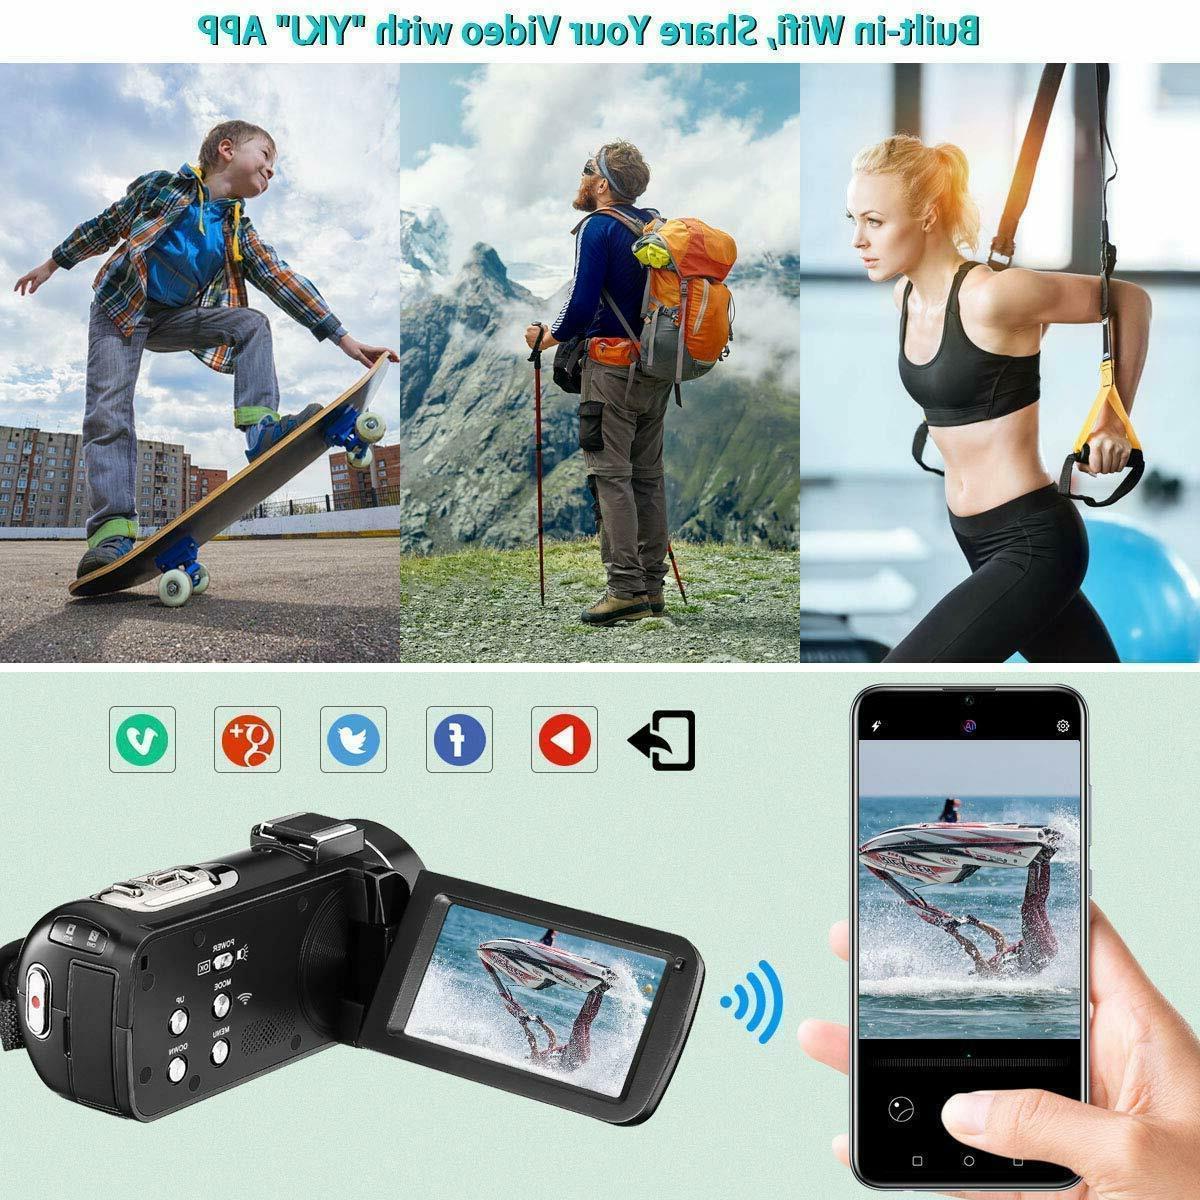 Video Camera Wifi Ir Night Vision 1080P 30Fps 26Mp Youtube Vloggin